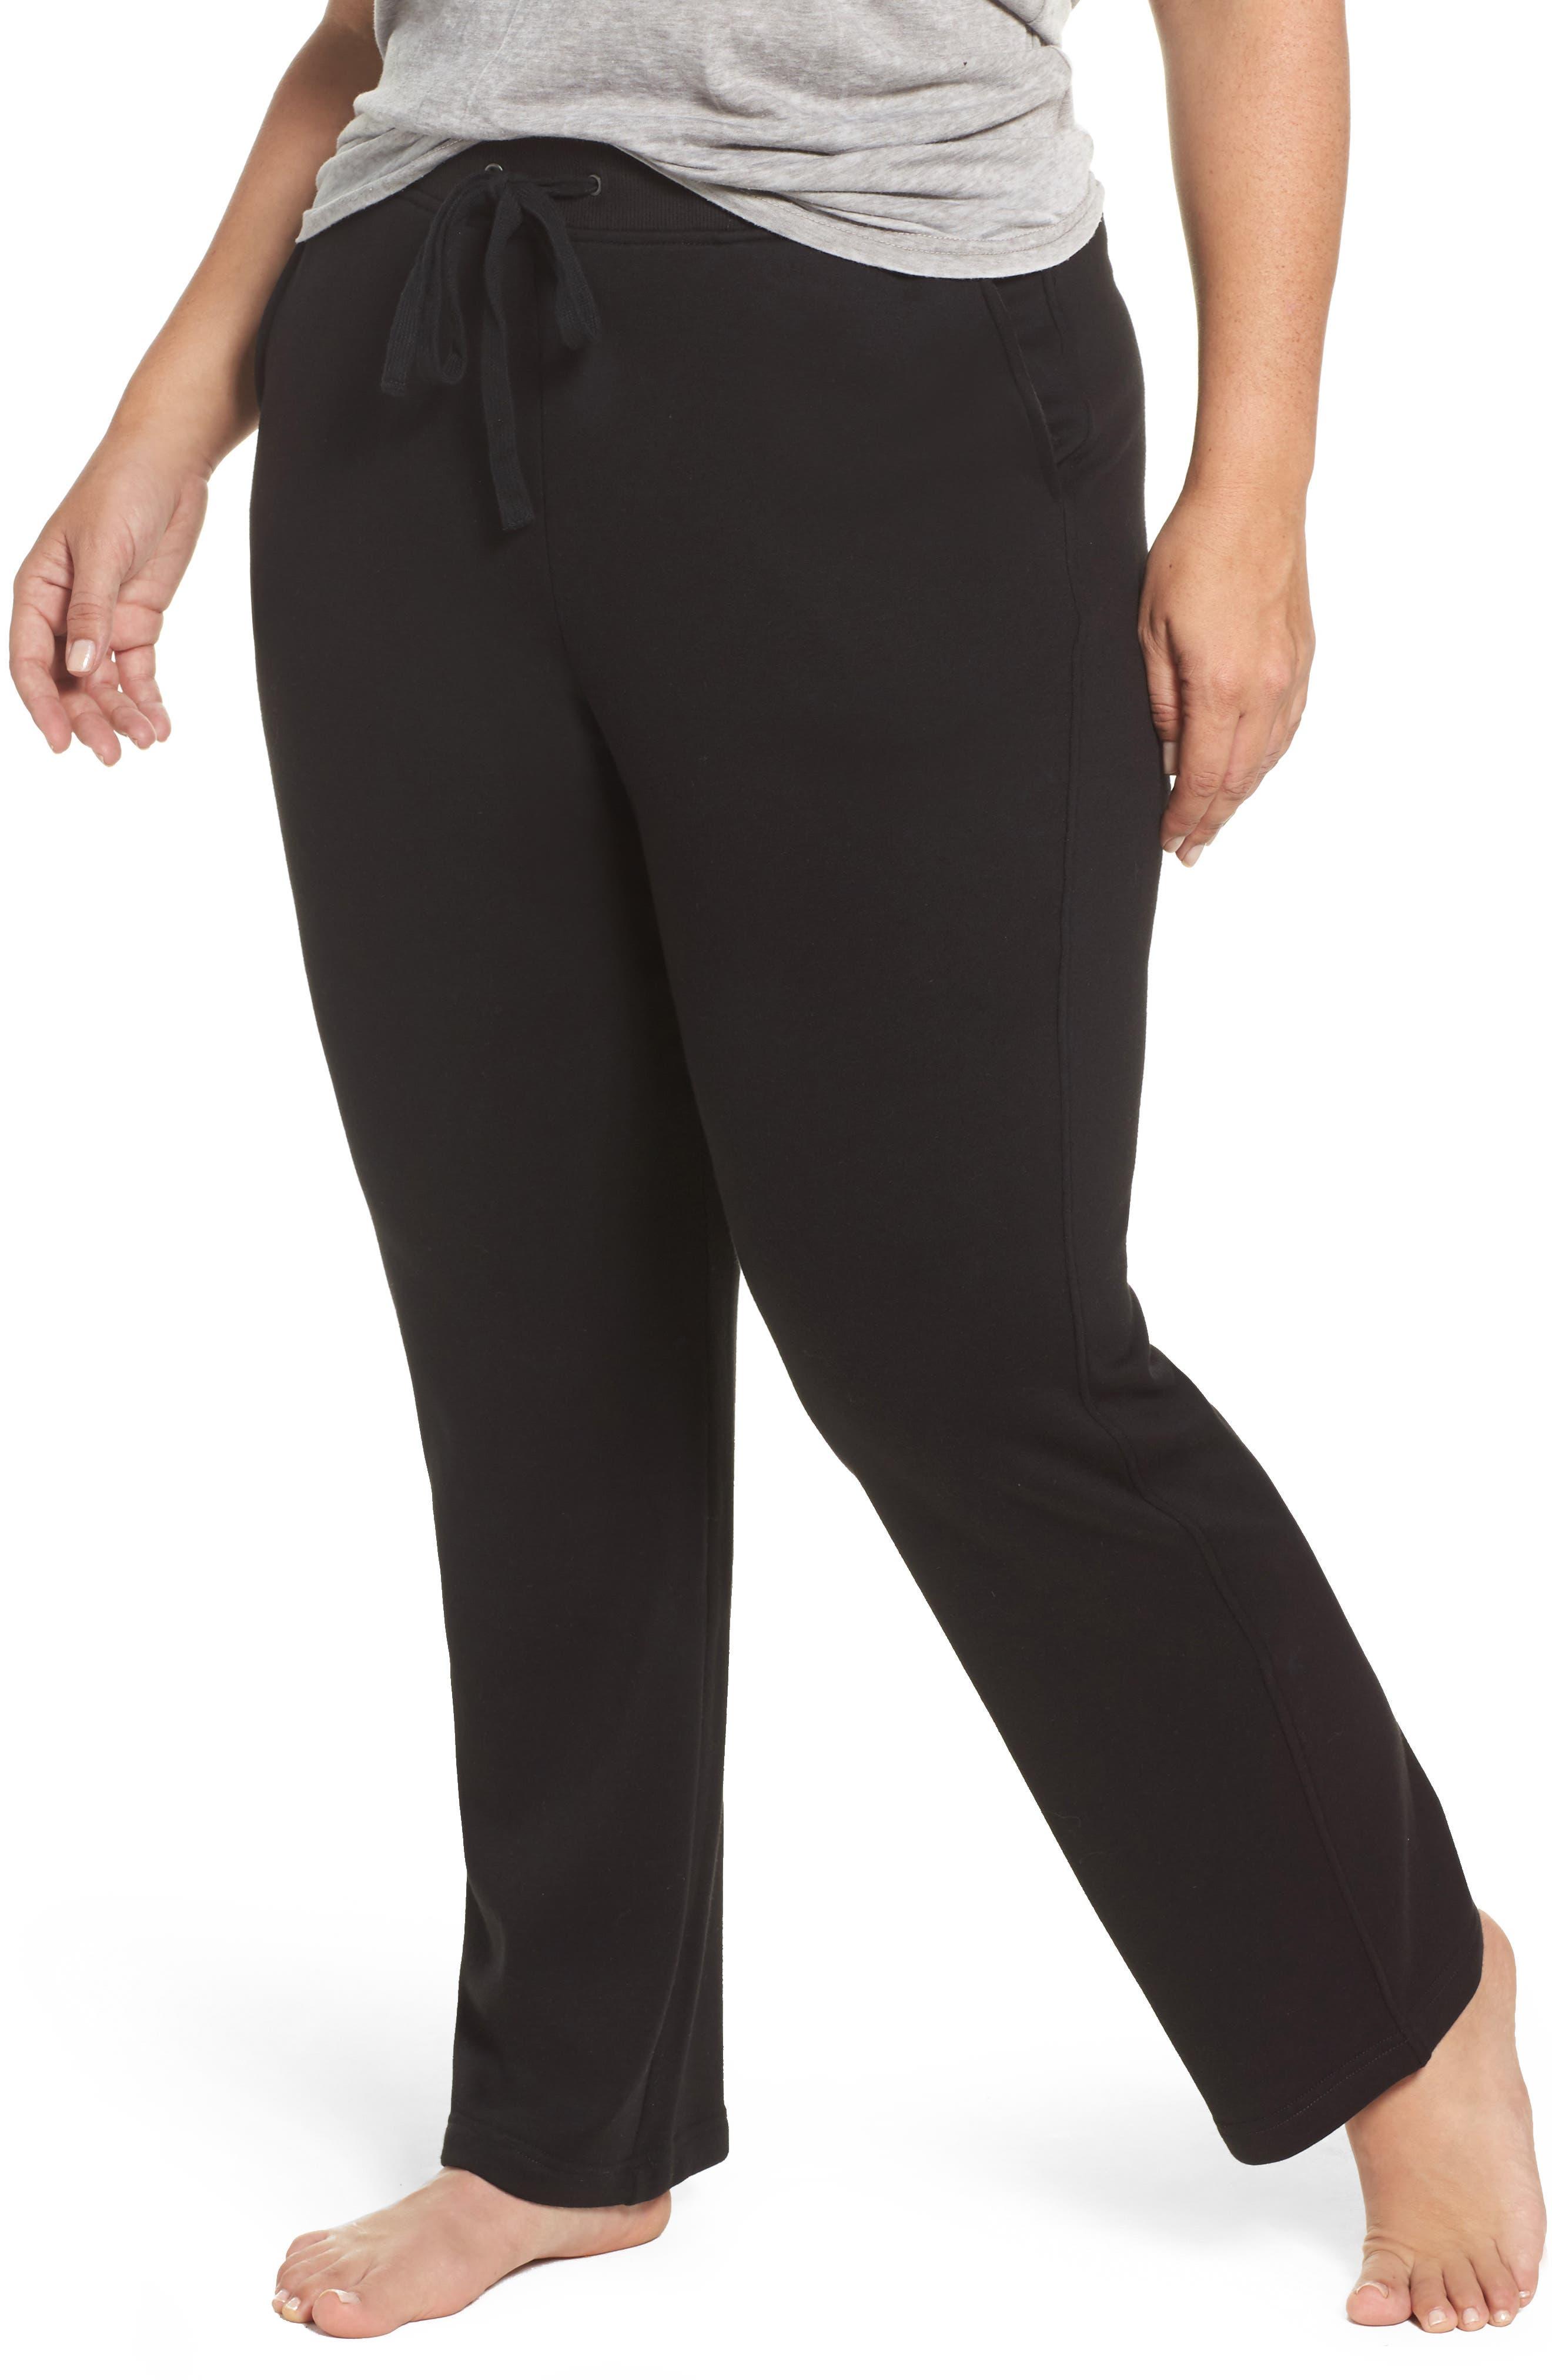 Penny Fleece Sweatpants,                         Main,                         color, BLACK